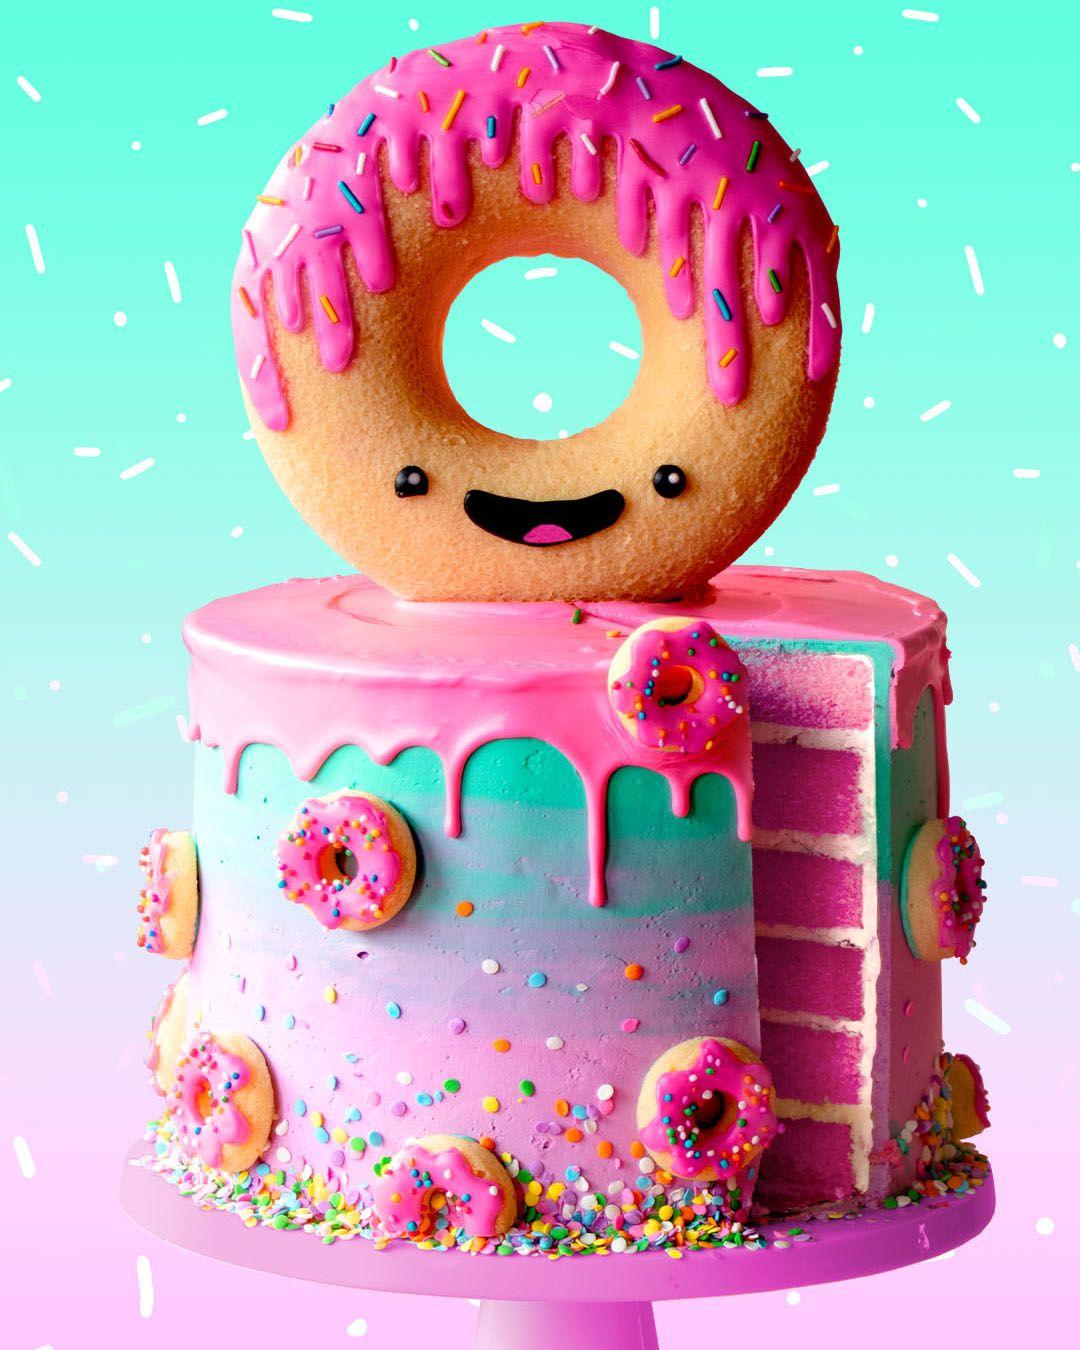 Epic Kawaii Donut Cake! #cakesanddeserts